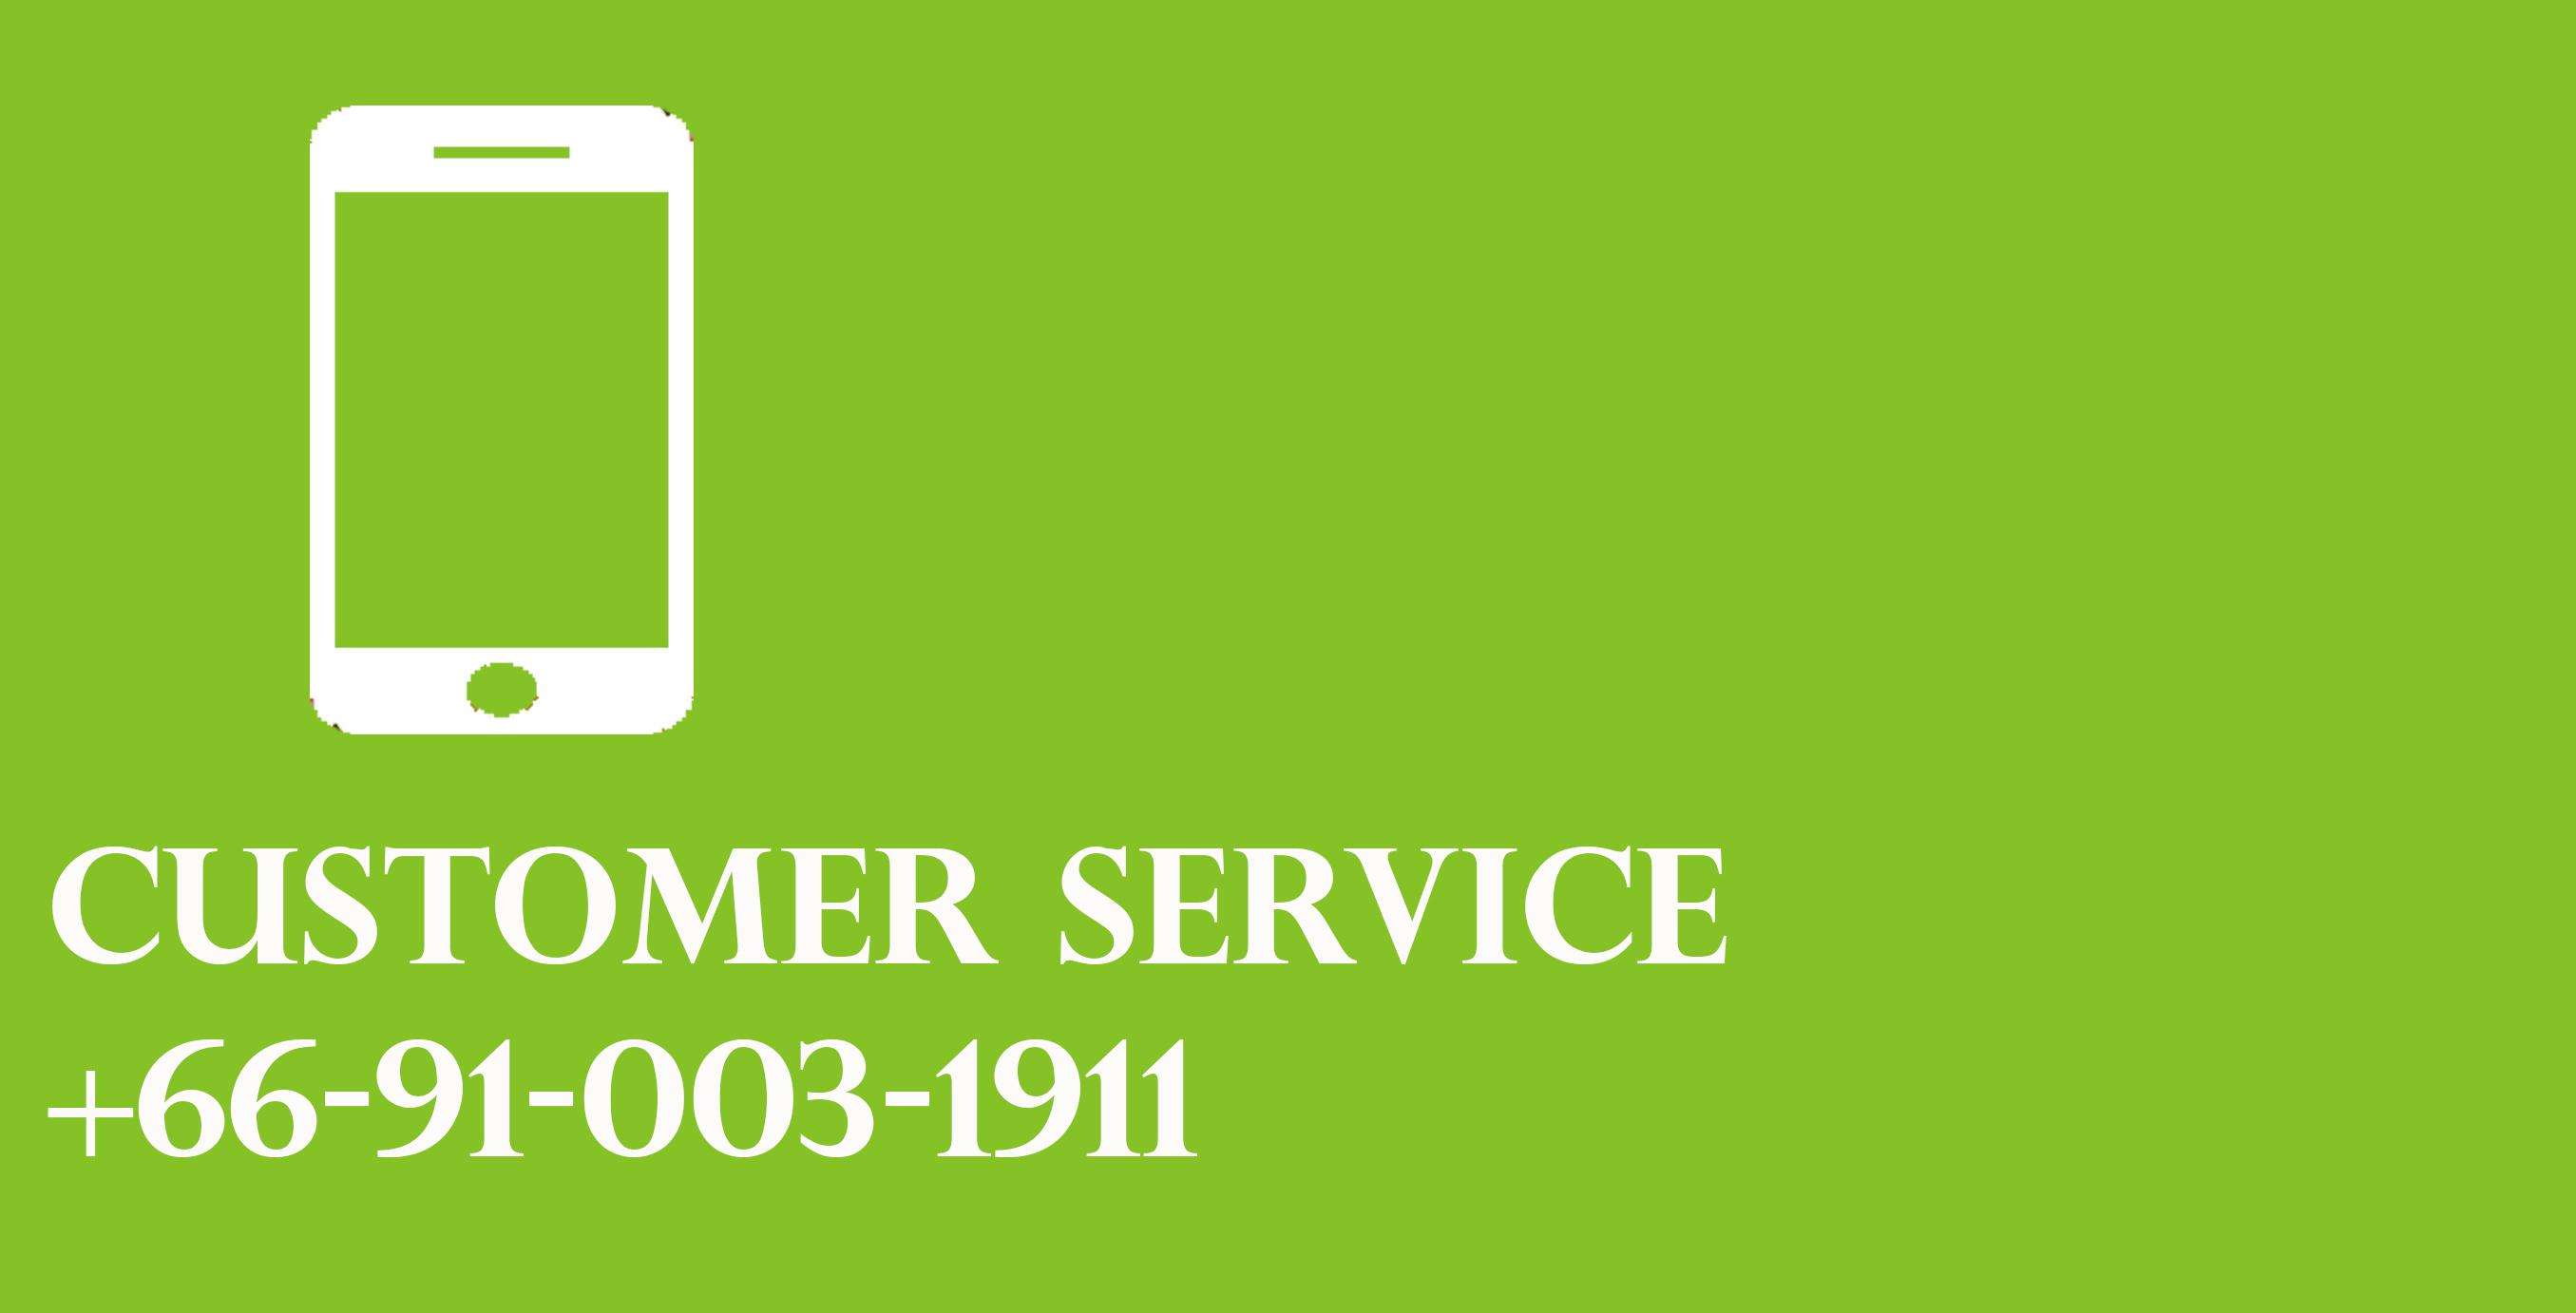 Customer-Service-number-interecom